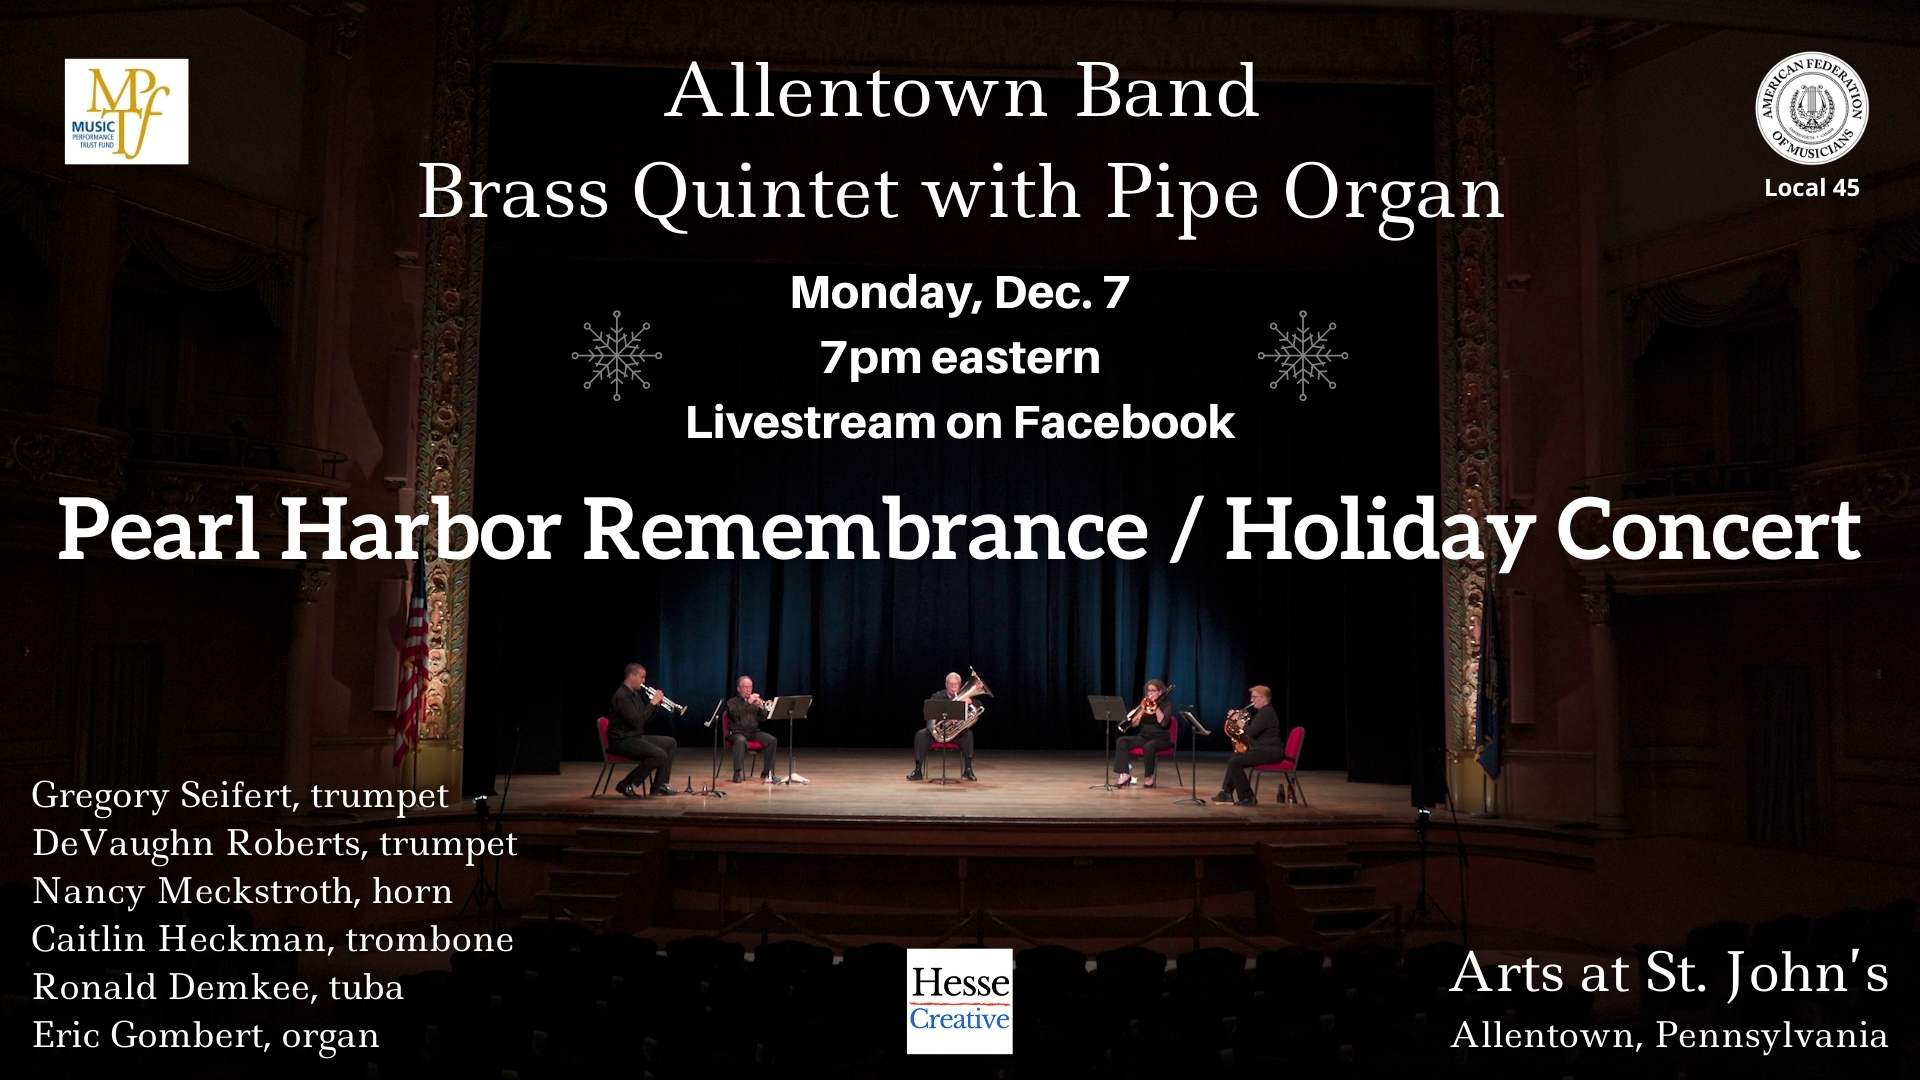 allentown band brass quintet